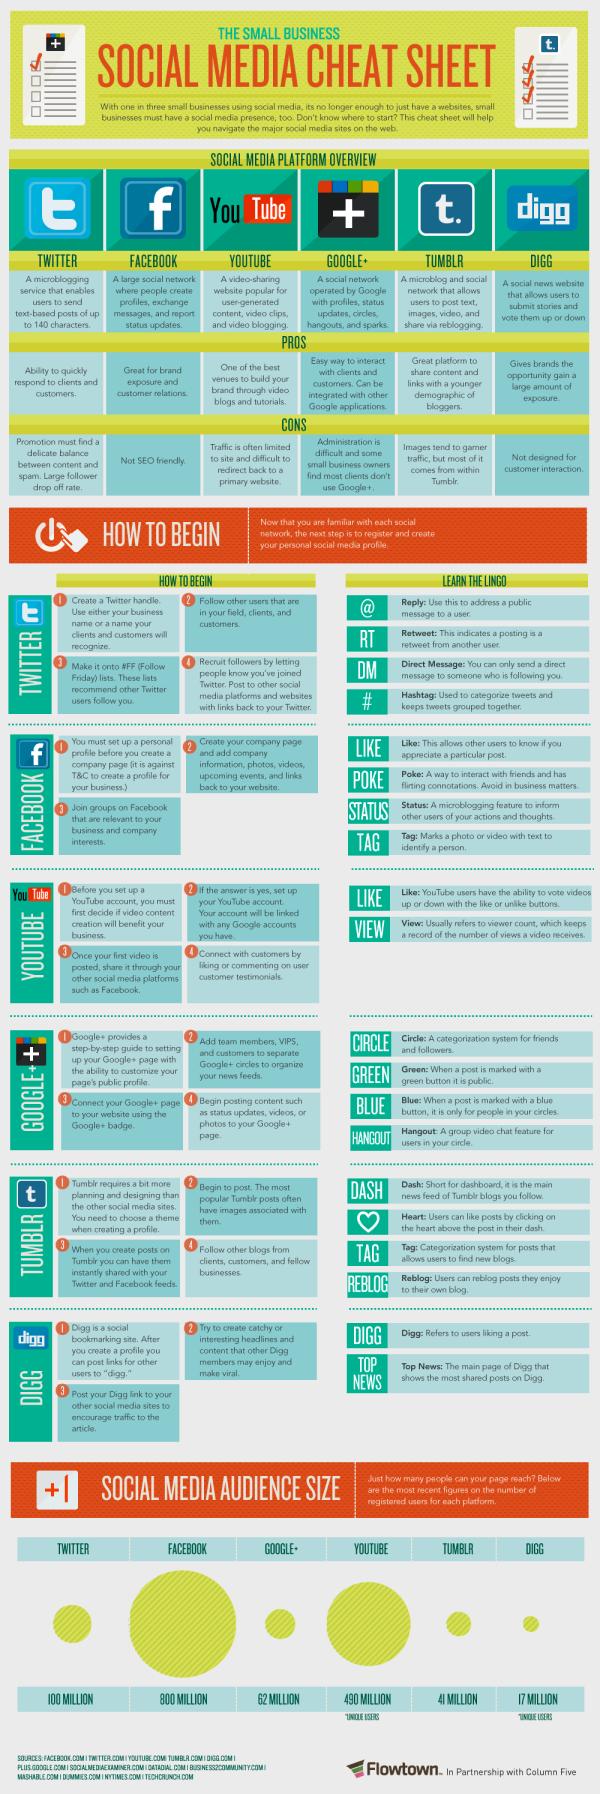 Small Business Social Media Cheat Sheet resized 600